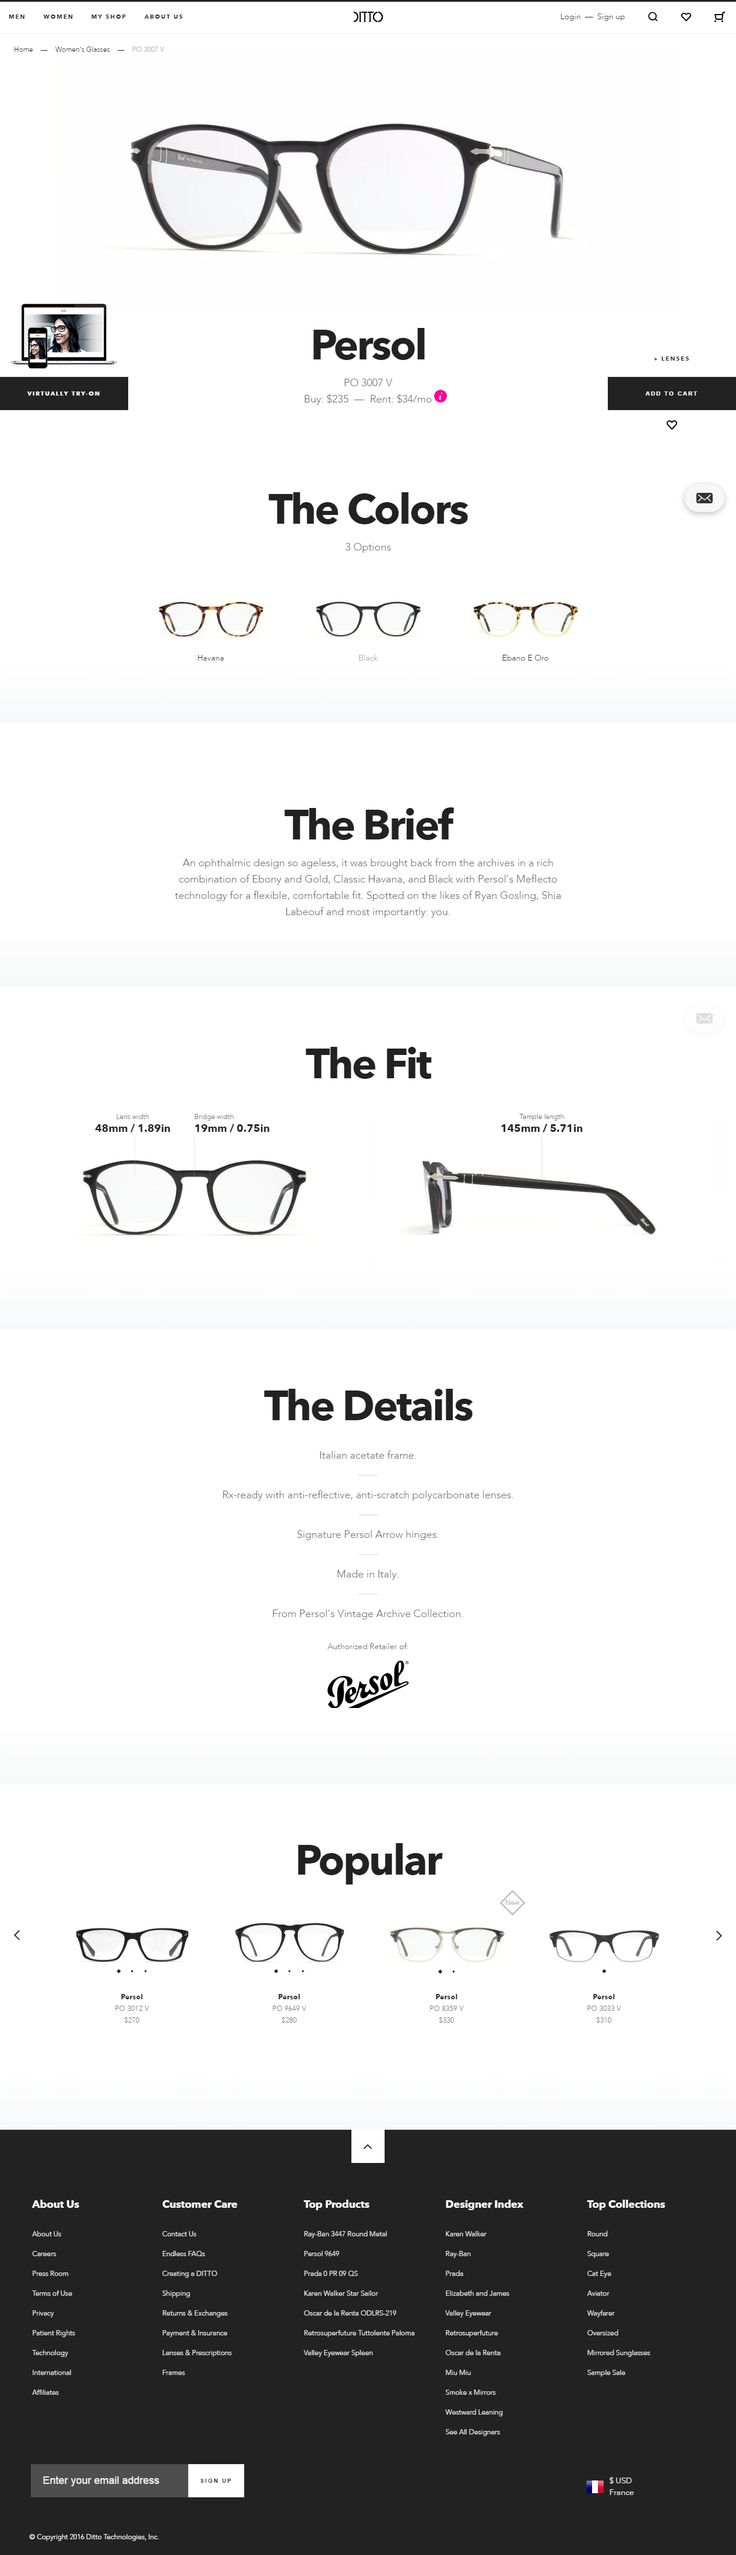 ux ui webdesign product page